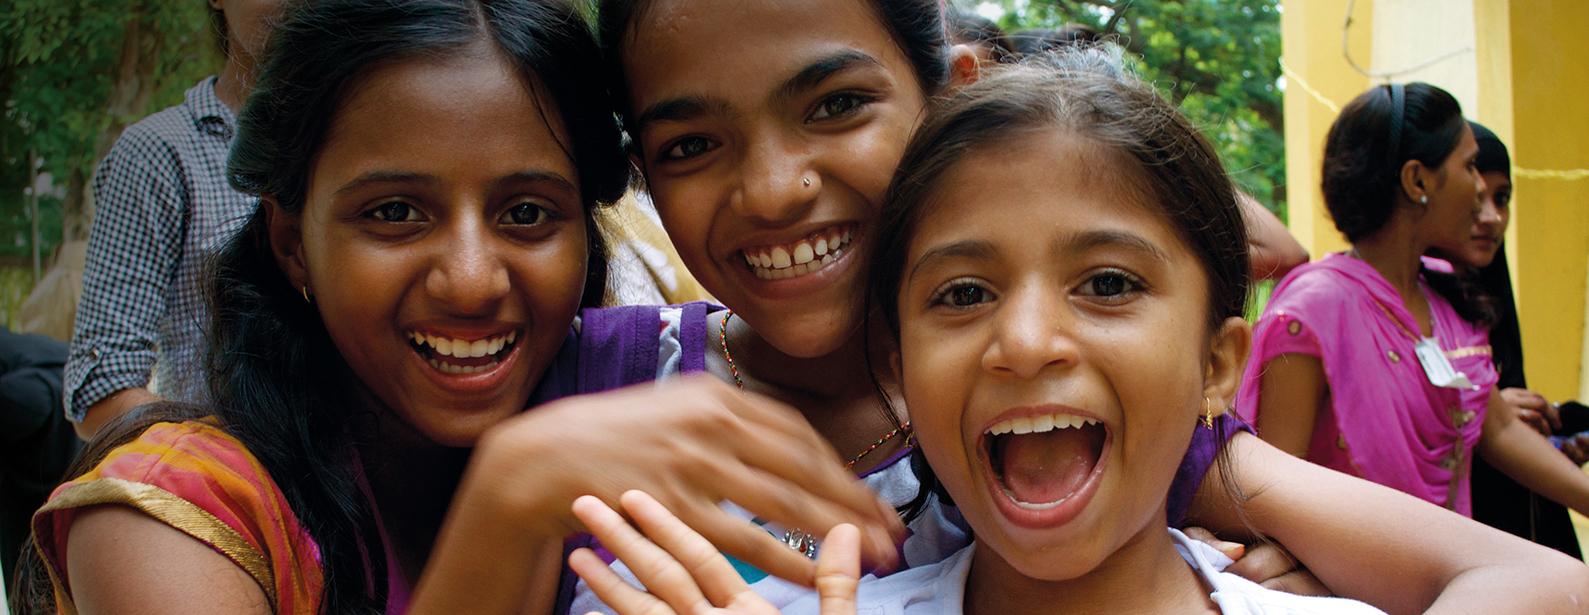 EMpower Girls Smiling Ocean_Barefoot